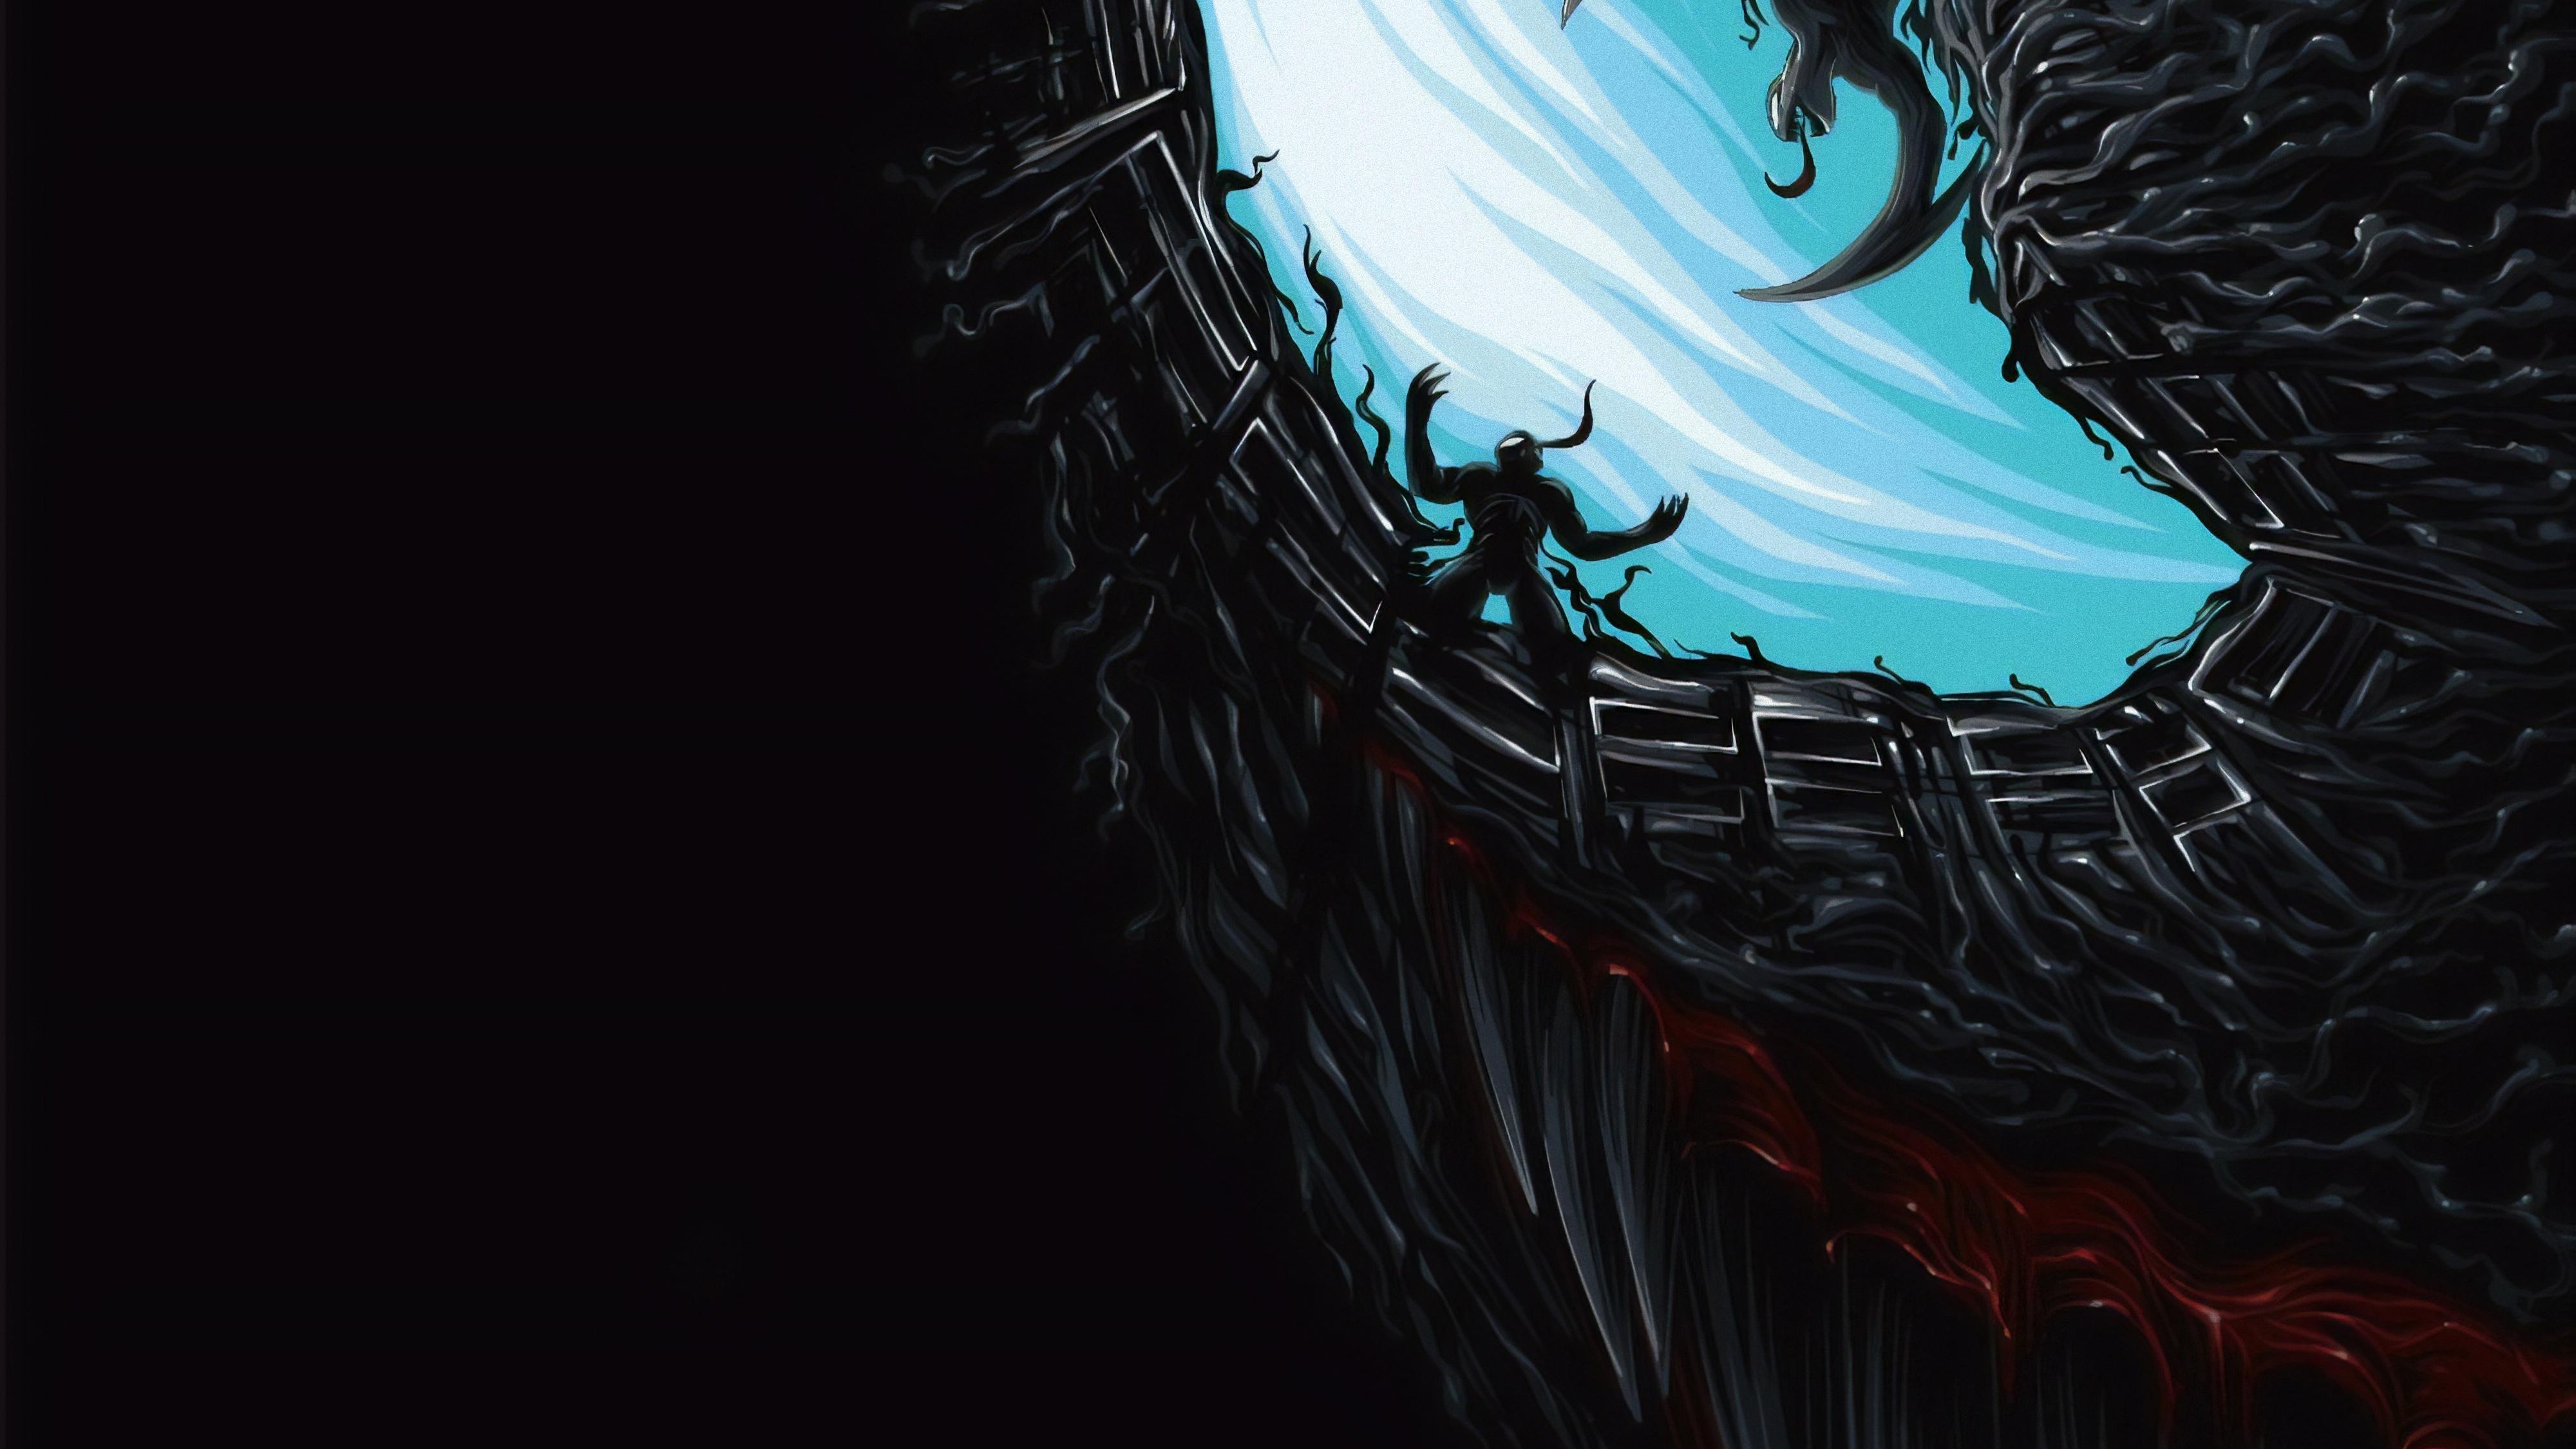 Venom movie new poster artwork hd movies 4k wallpapers - 4k wallpaper venom ...